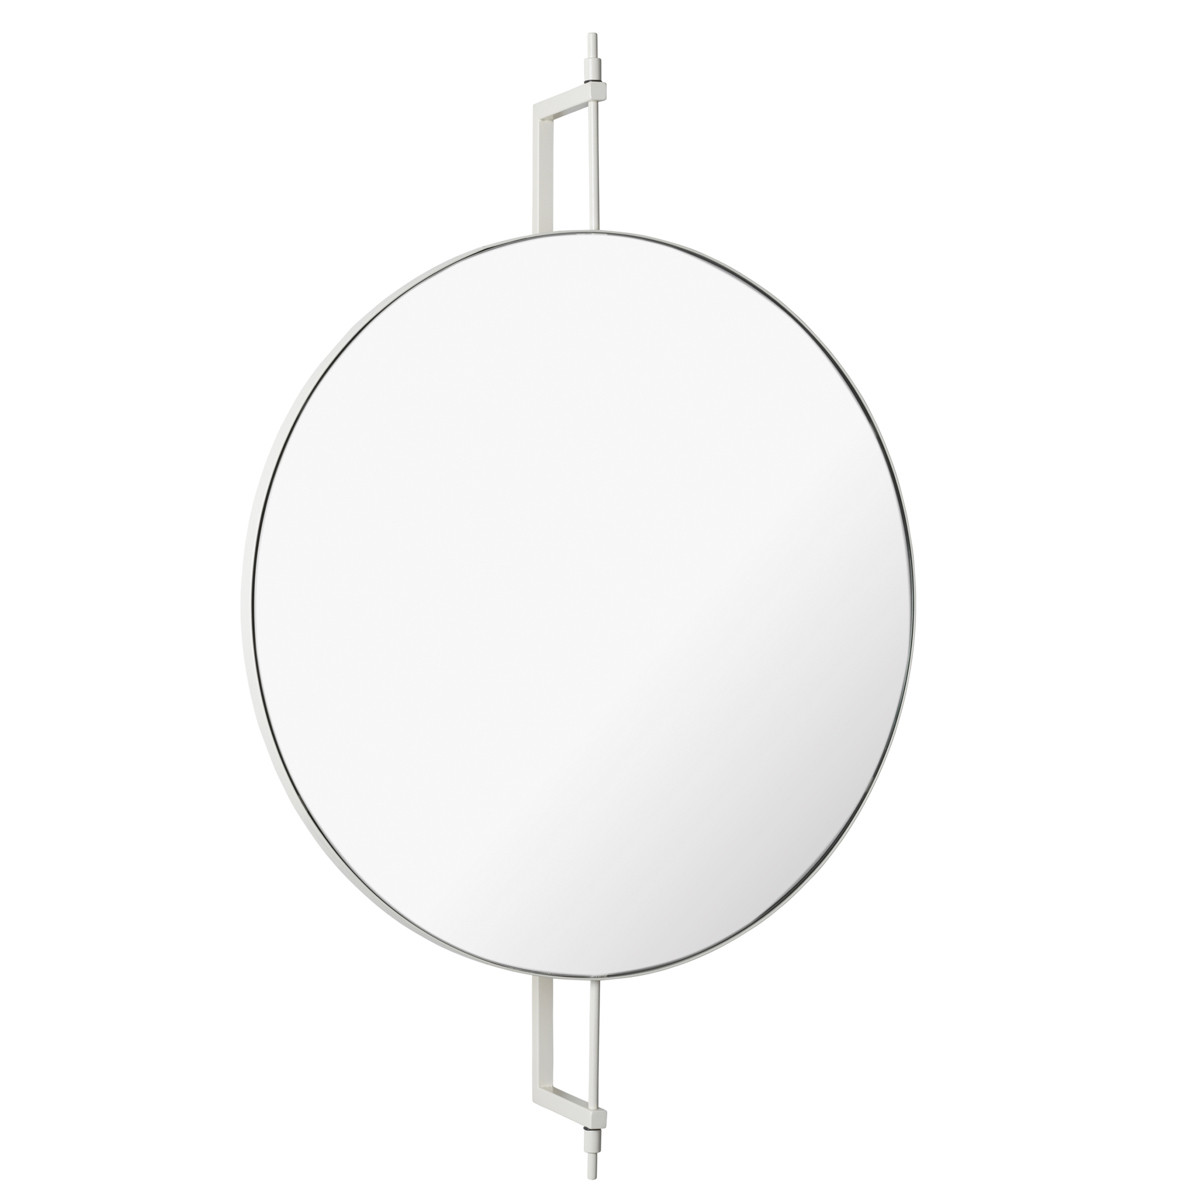 Kristina Dam Rotating Mirror